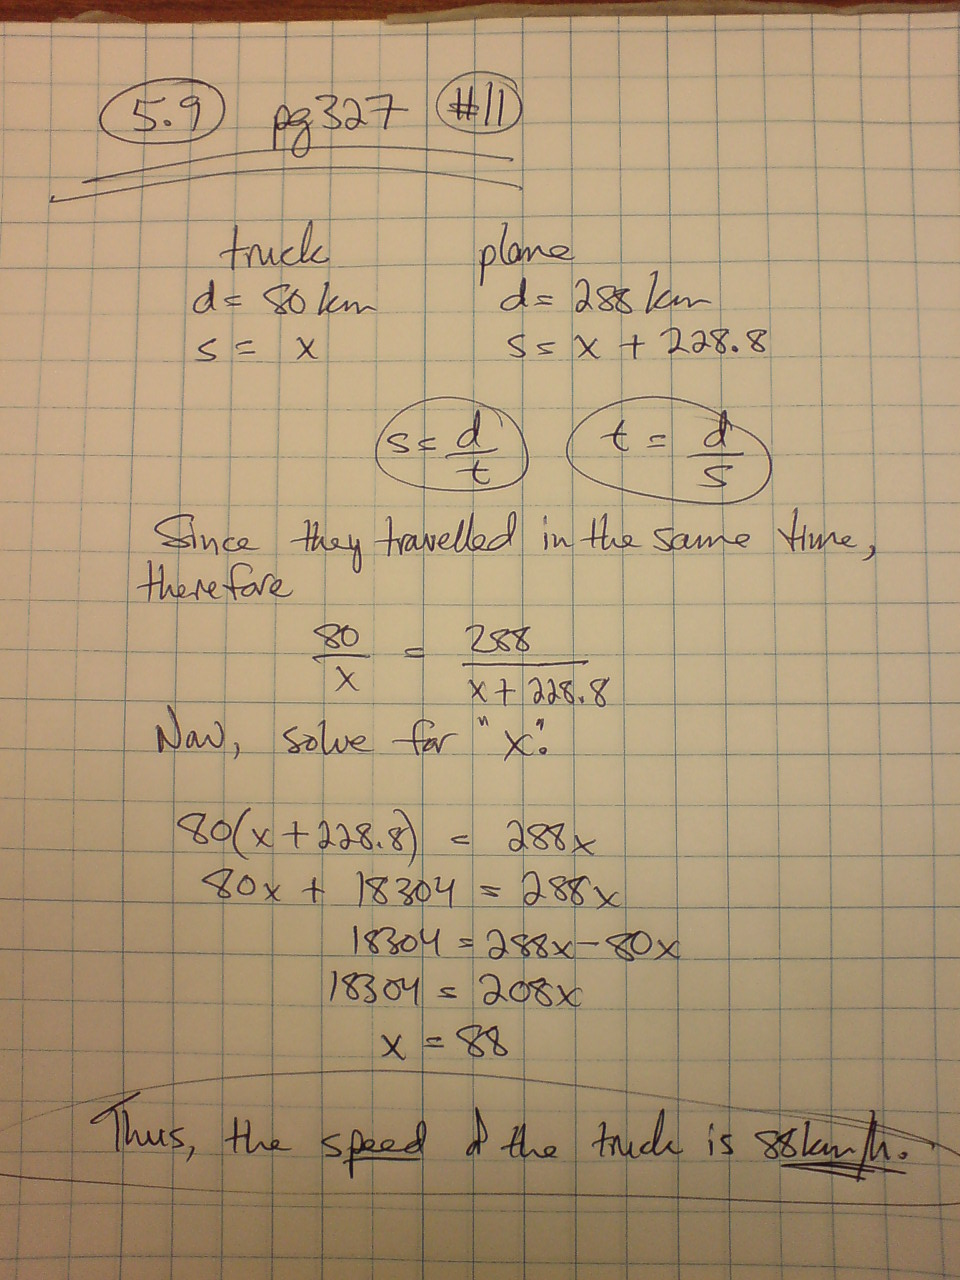 needmathhelp.com ... grade 9 mathematics ... The path is full of ...